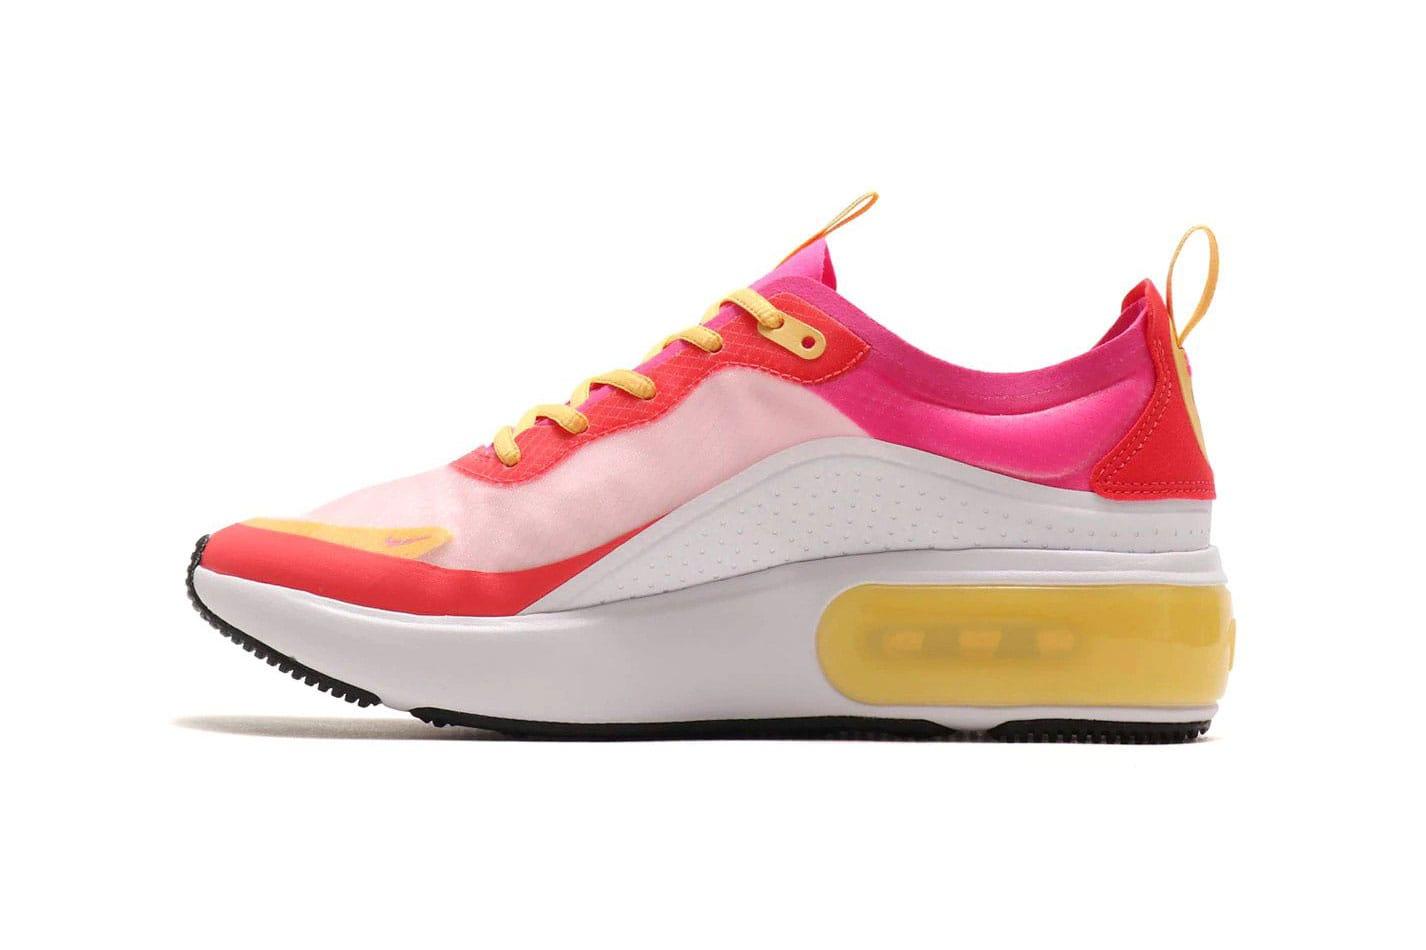 Nike's Air Max Dia SE in Pink, Yellow